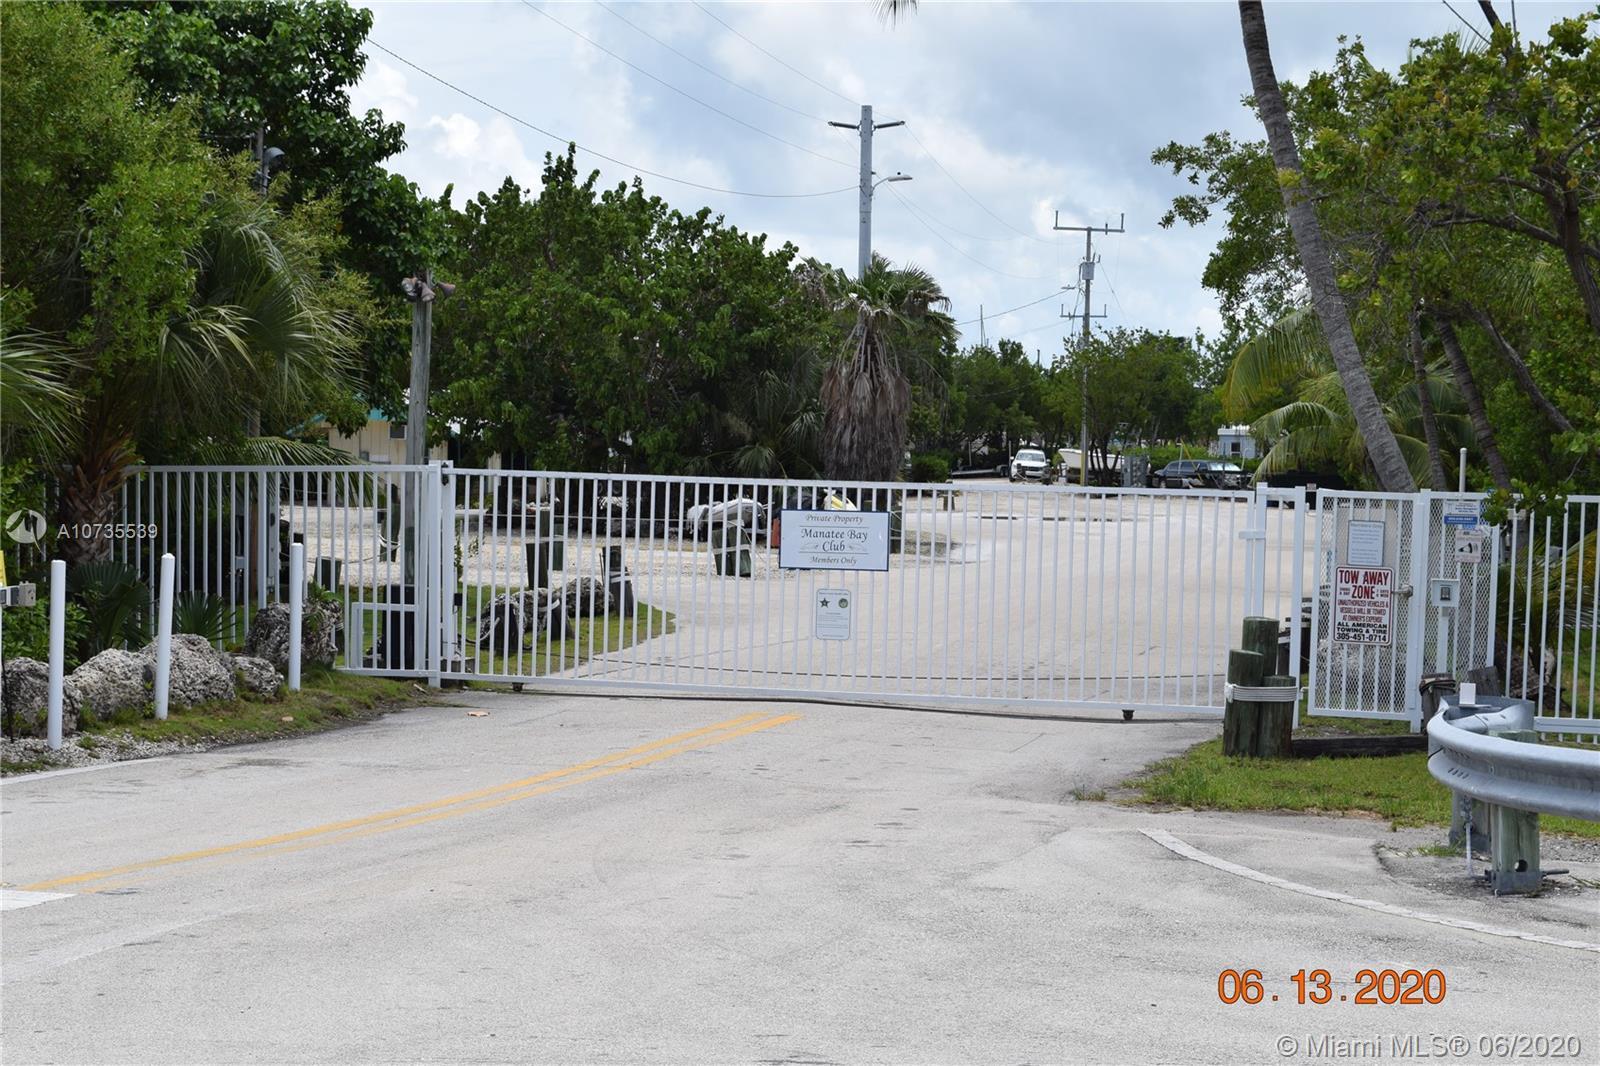 Morris Ave Ln D-10, Other City - Keys/Islands/Caribb, FL 33037 - Other City - Keys/Islands/Caribb, FL real estate listing